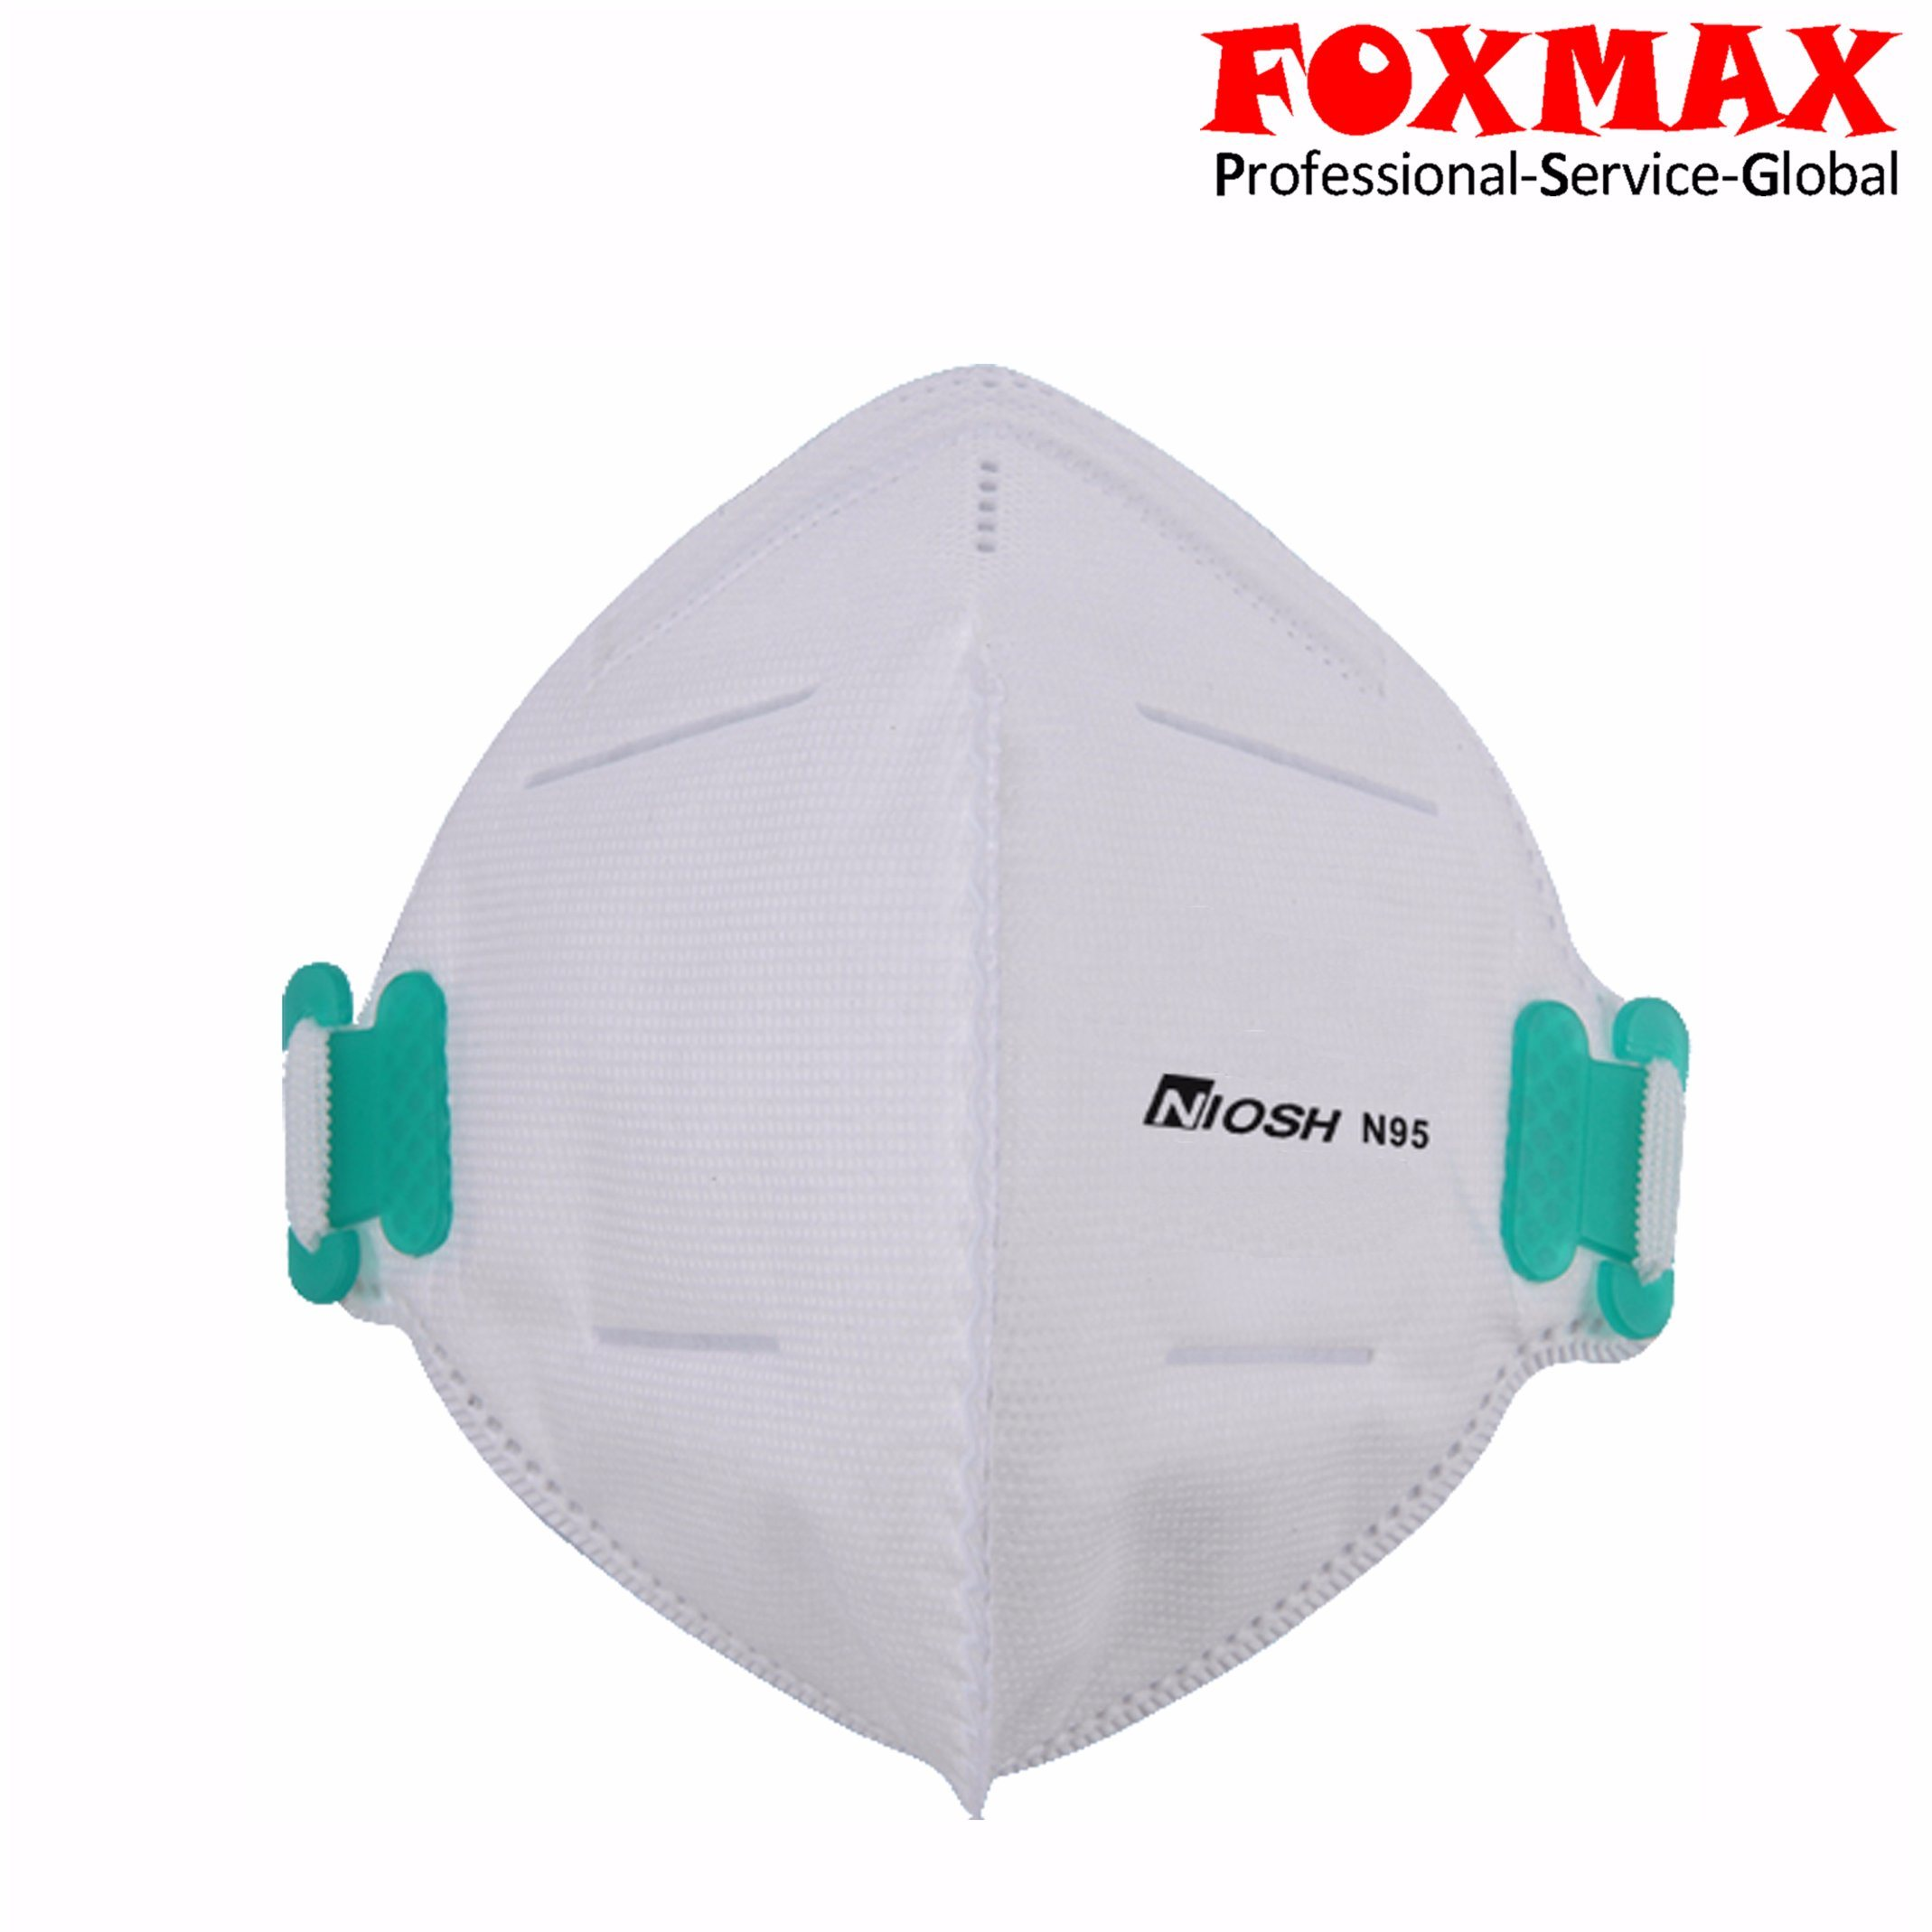 hot Niosh fx-m06 Approved Mask N95 Item